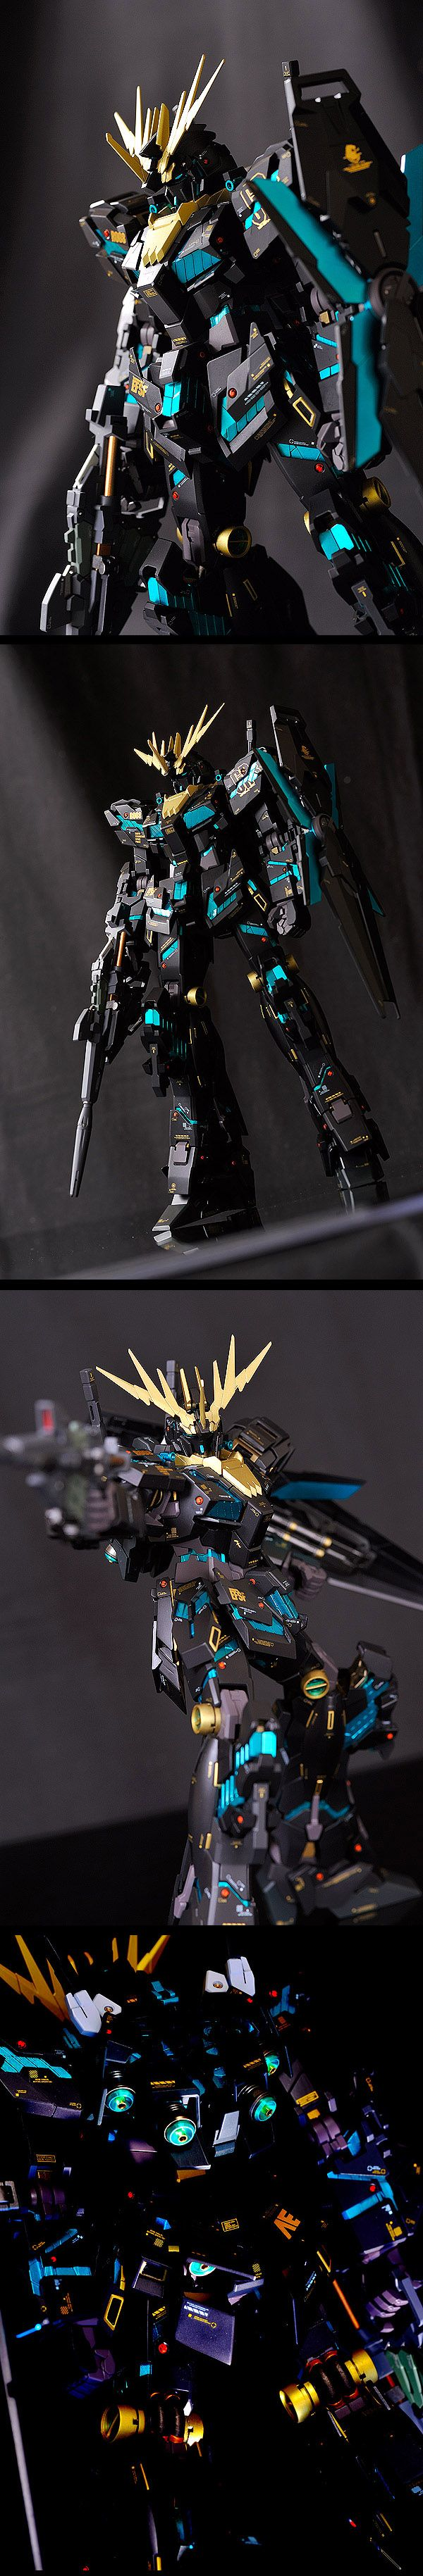 MG Full Armor Unicorn Gundam Banshee [Ver.覚醒] w/Base Jabber: Remodeling Work by Gatto Nero [がっとねろ] Full Photoreview Wallpaper Size Images [WIP too], Info | GUNJAP